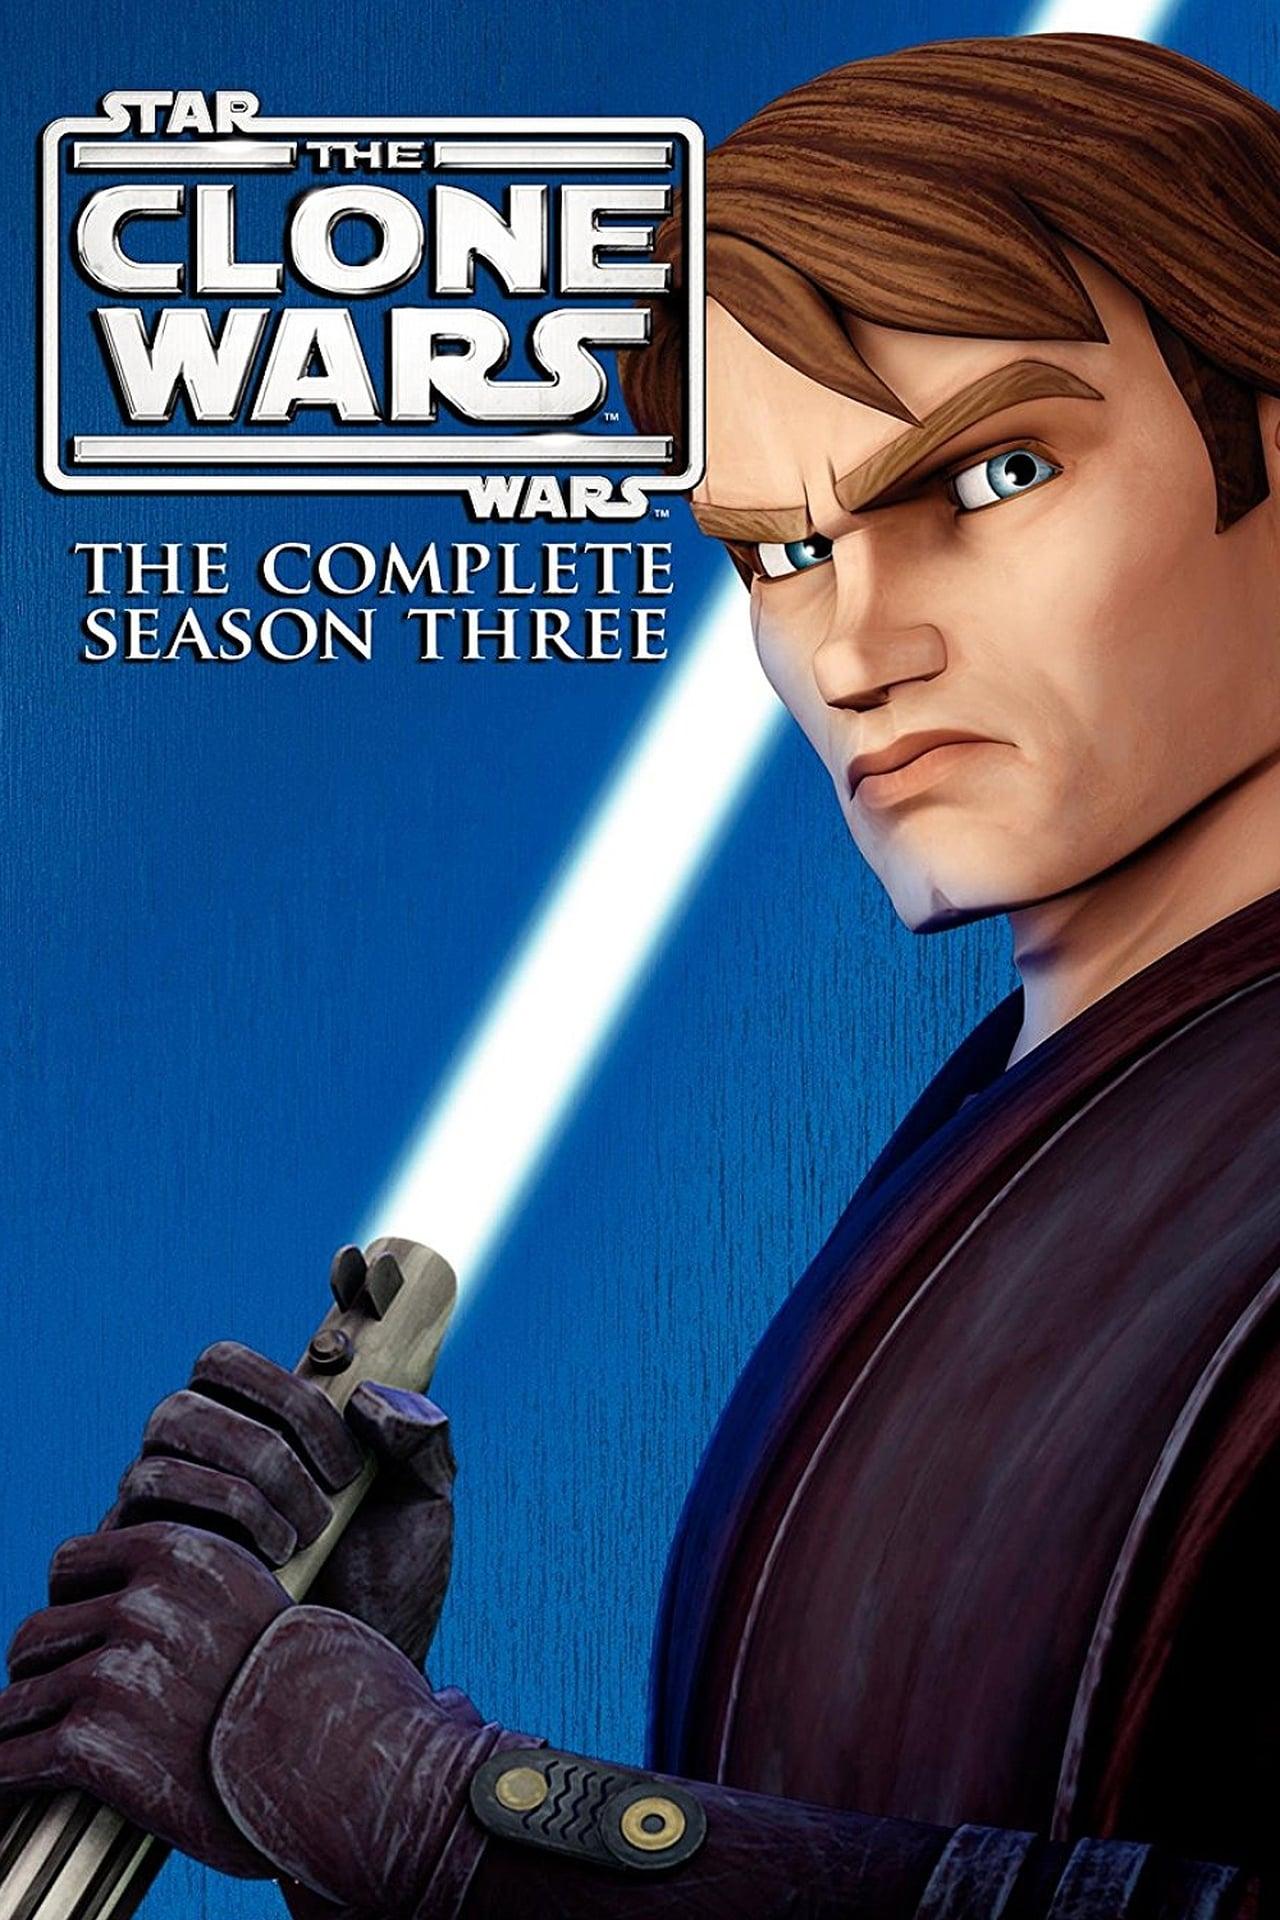 Star Wars: The Clone Wars (2010)